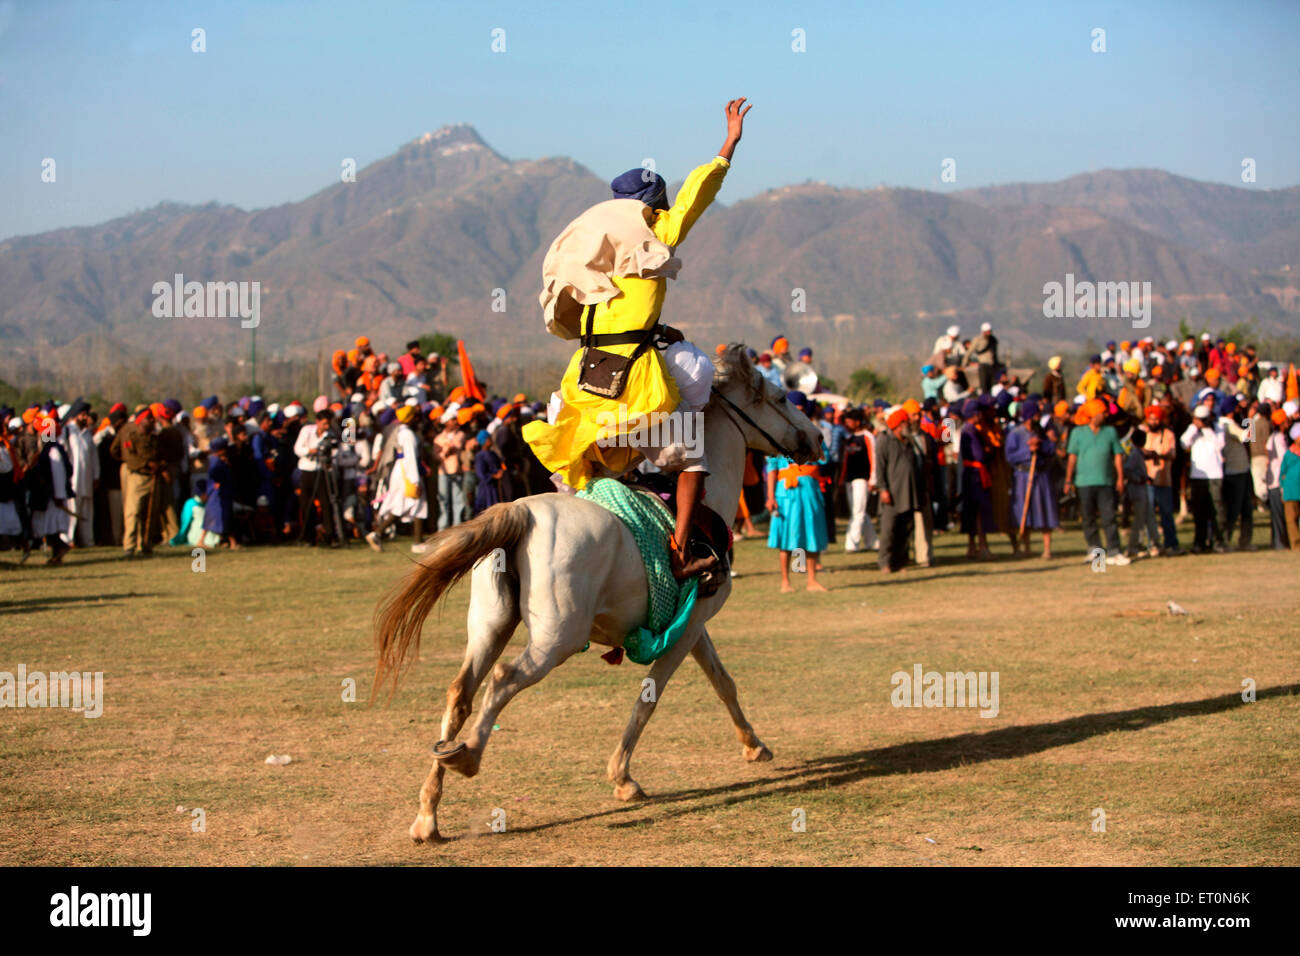 Nihang or Sikh warrior performing stunts riding on horse during Hola Mohalla festival at Anandpur sahib - Stock Image